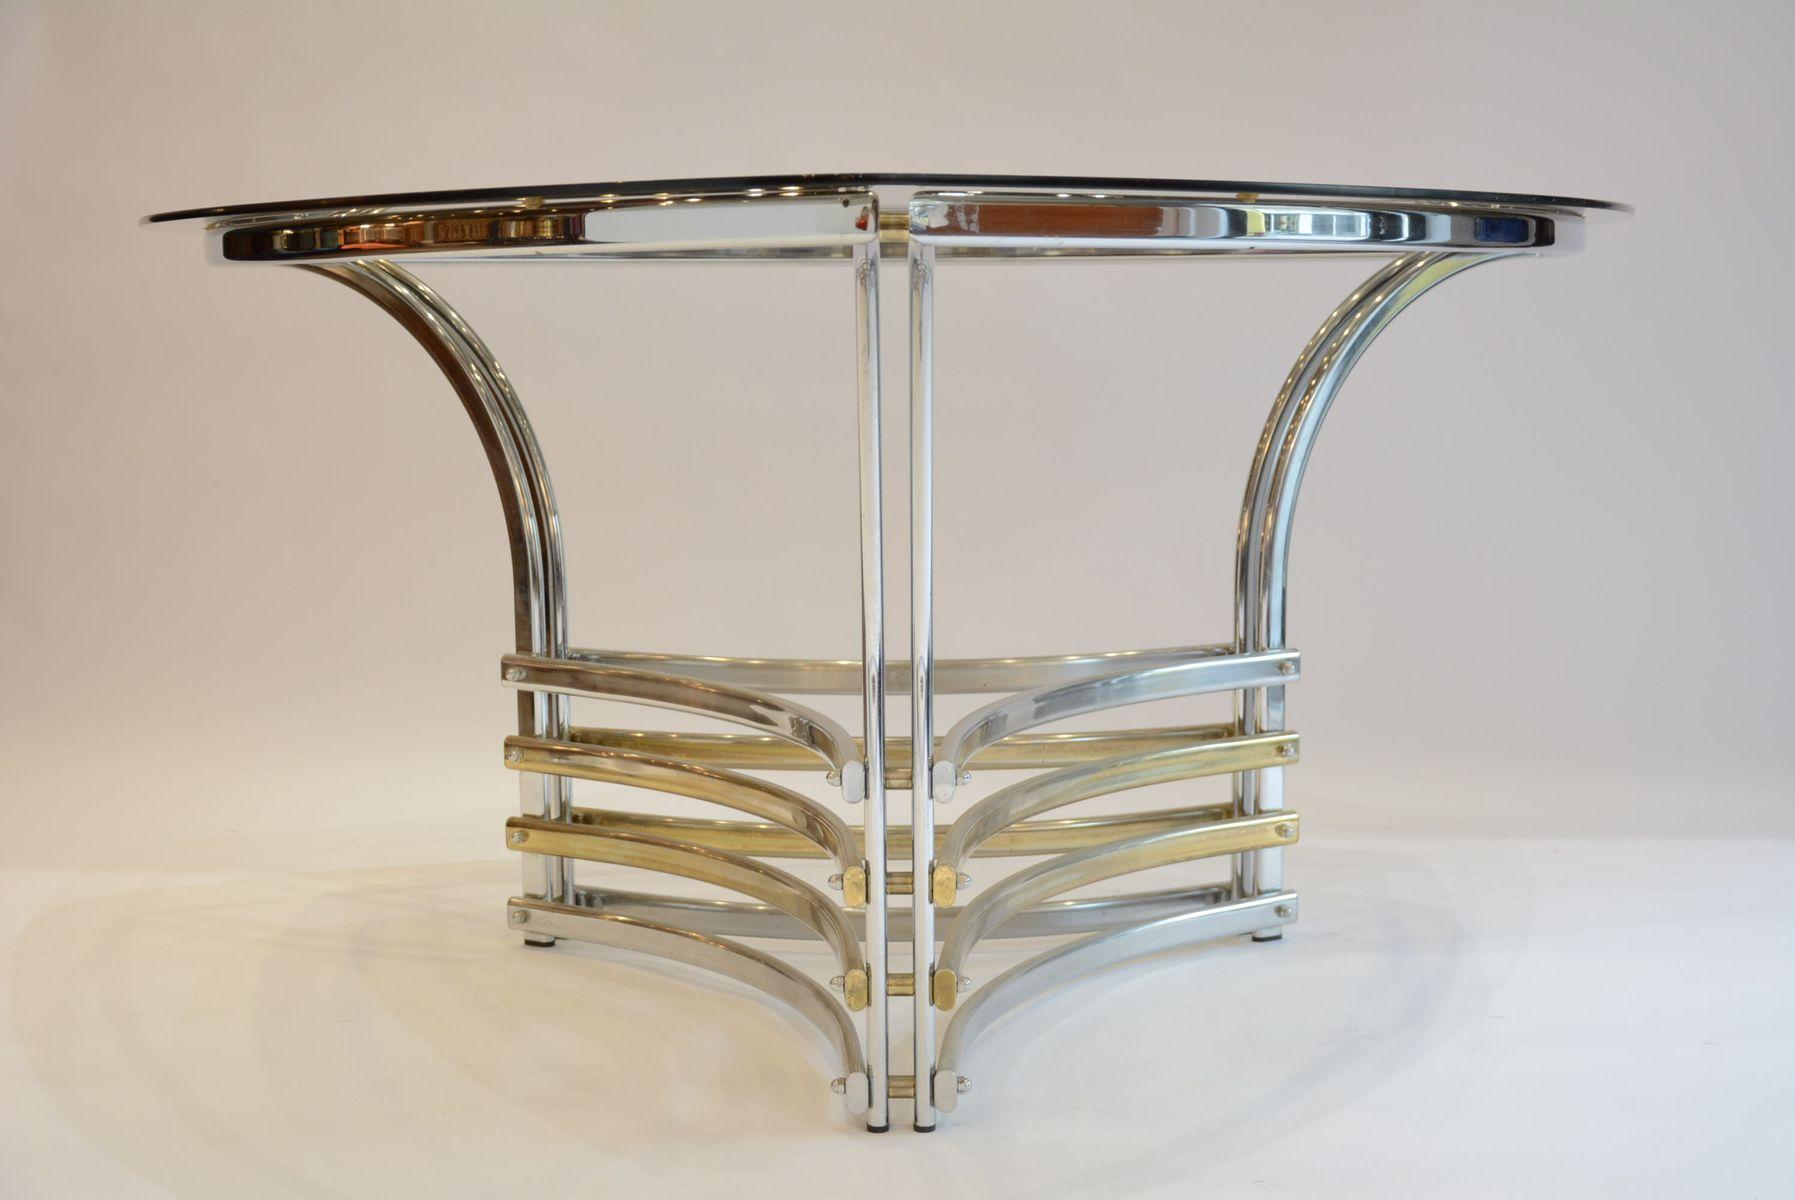 table en chrome verre fum italie 1970s en vente sur pamono. Black Bedroom Furniture Sets. Home Design Ideas